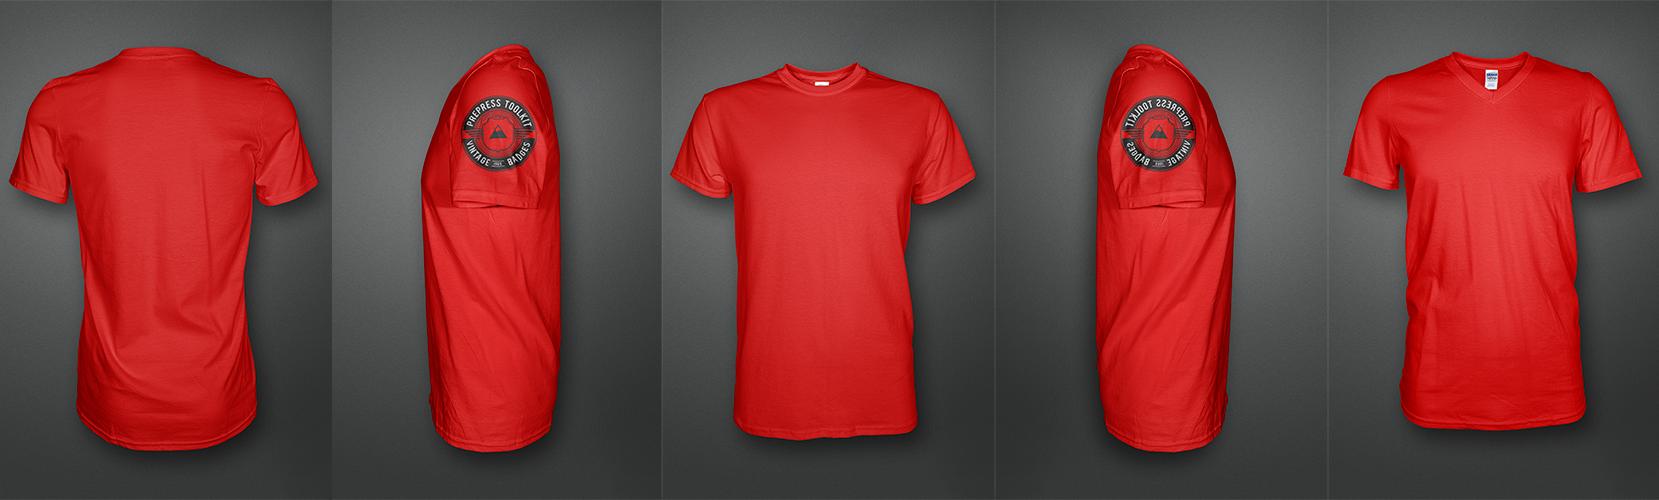 camisetapresenatcion